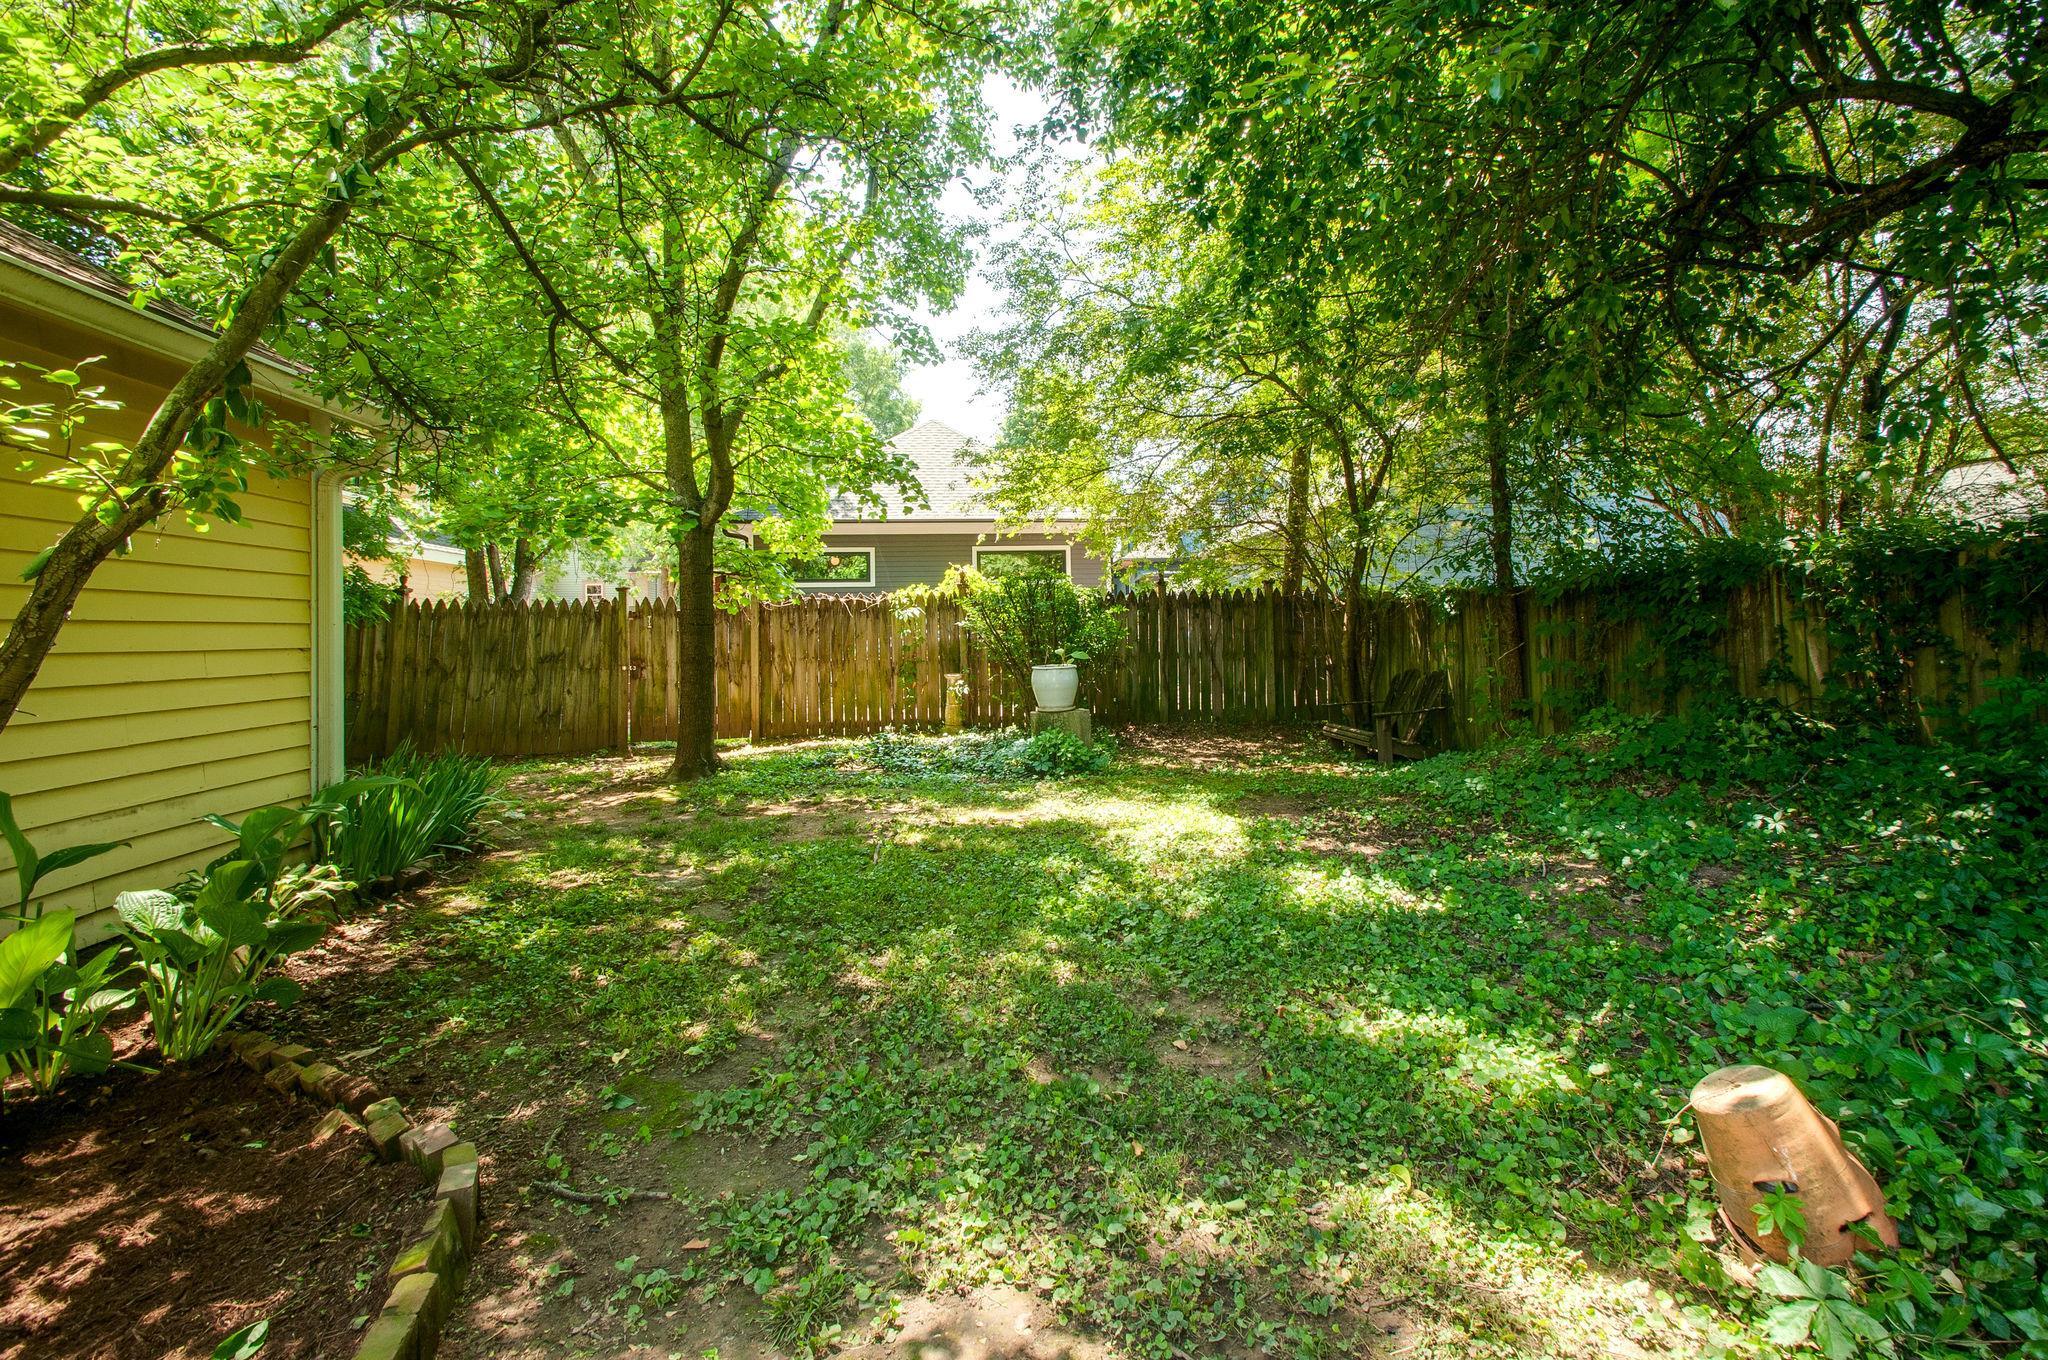 backyard garden area